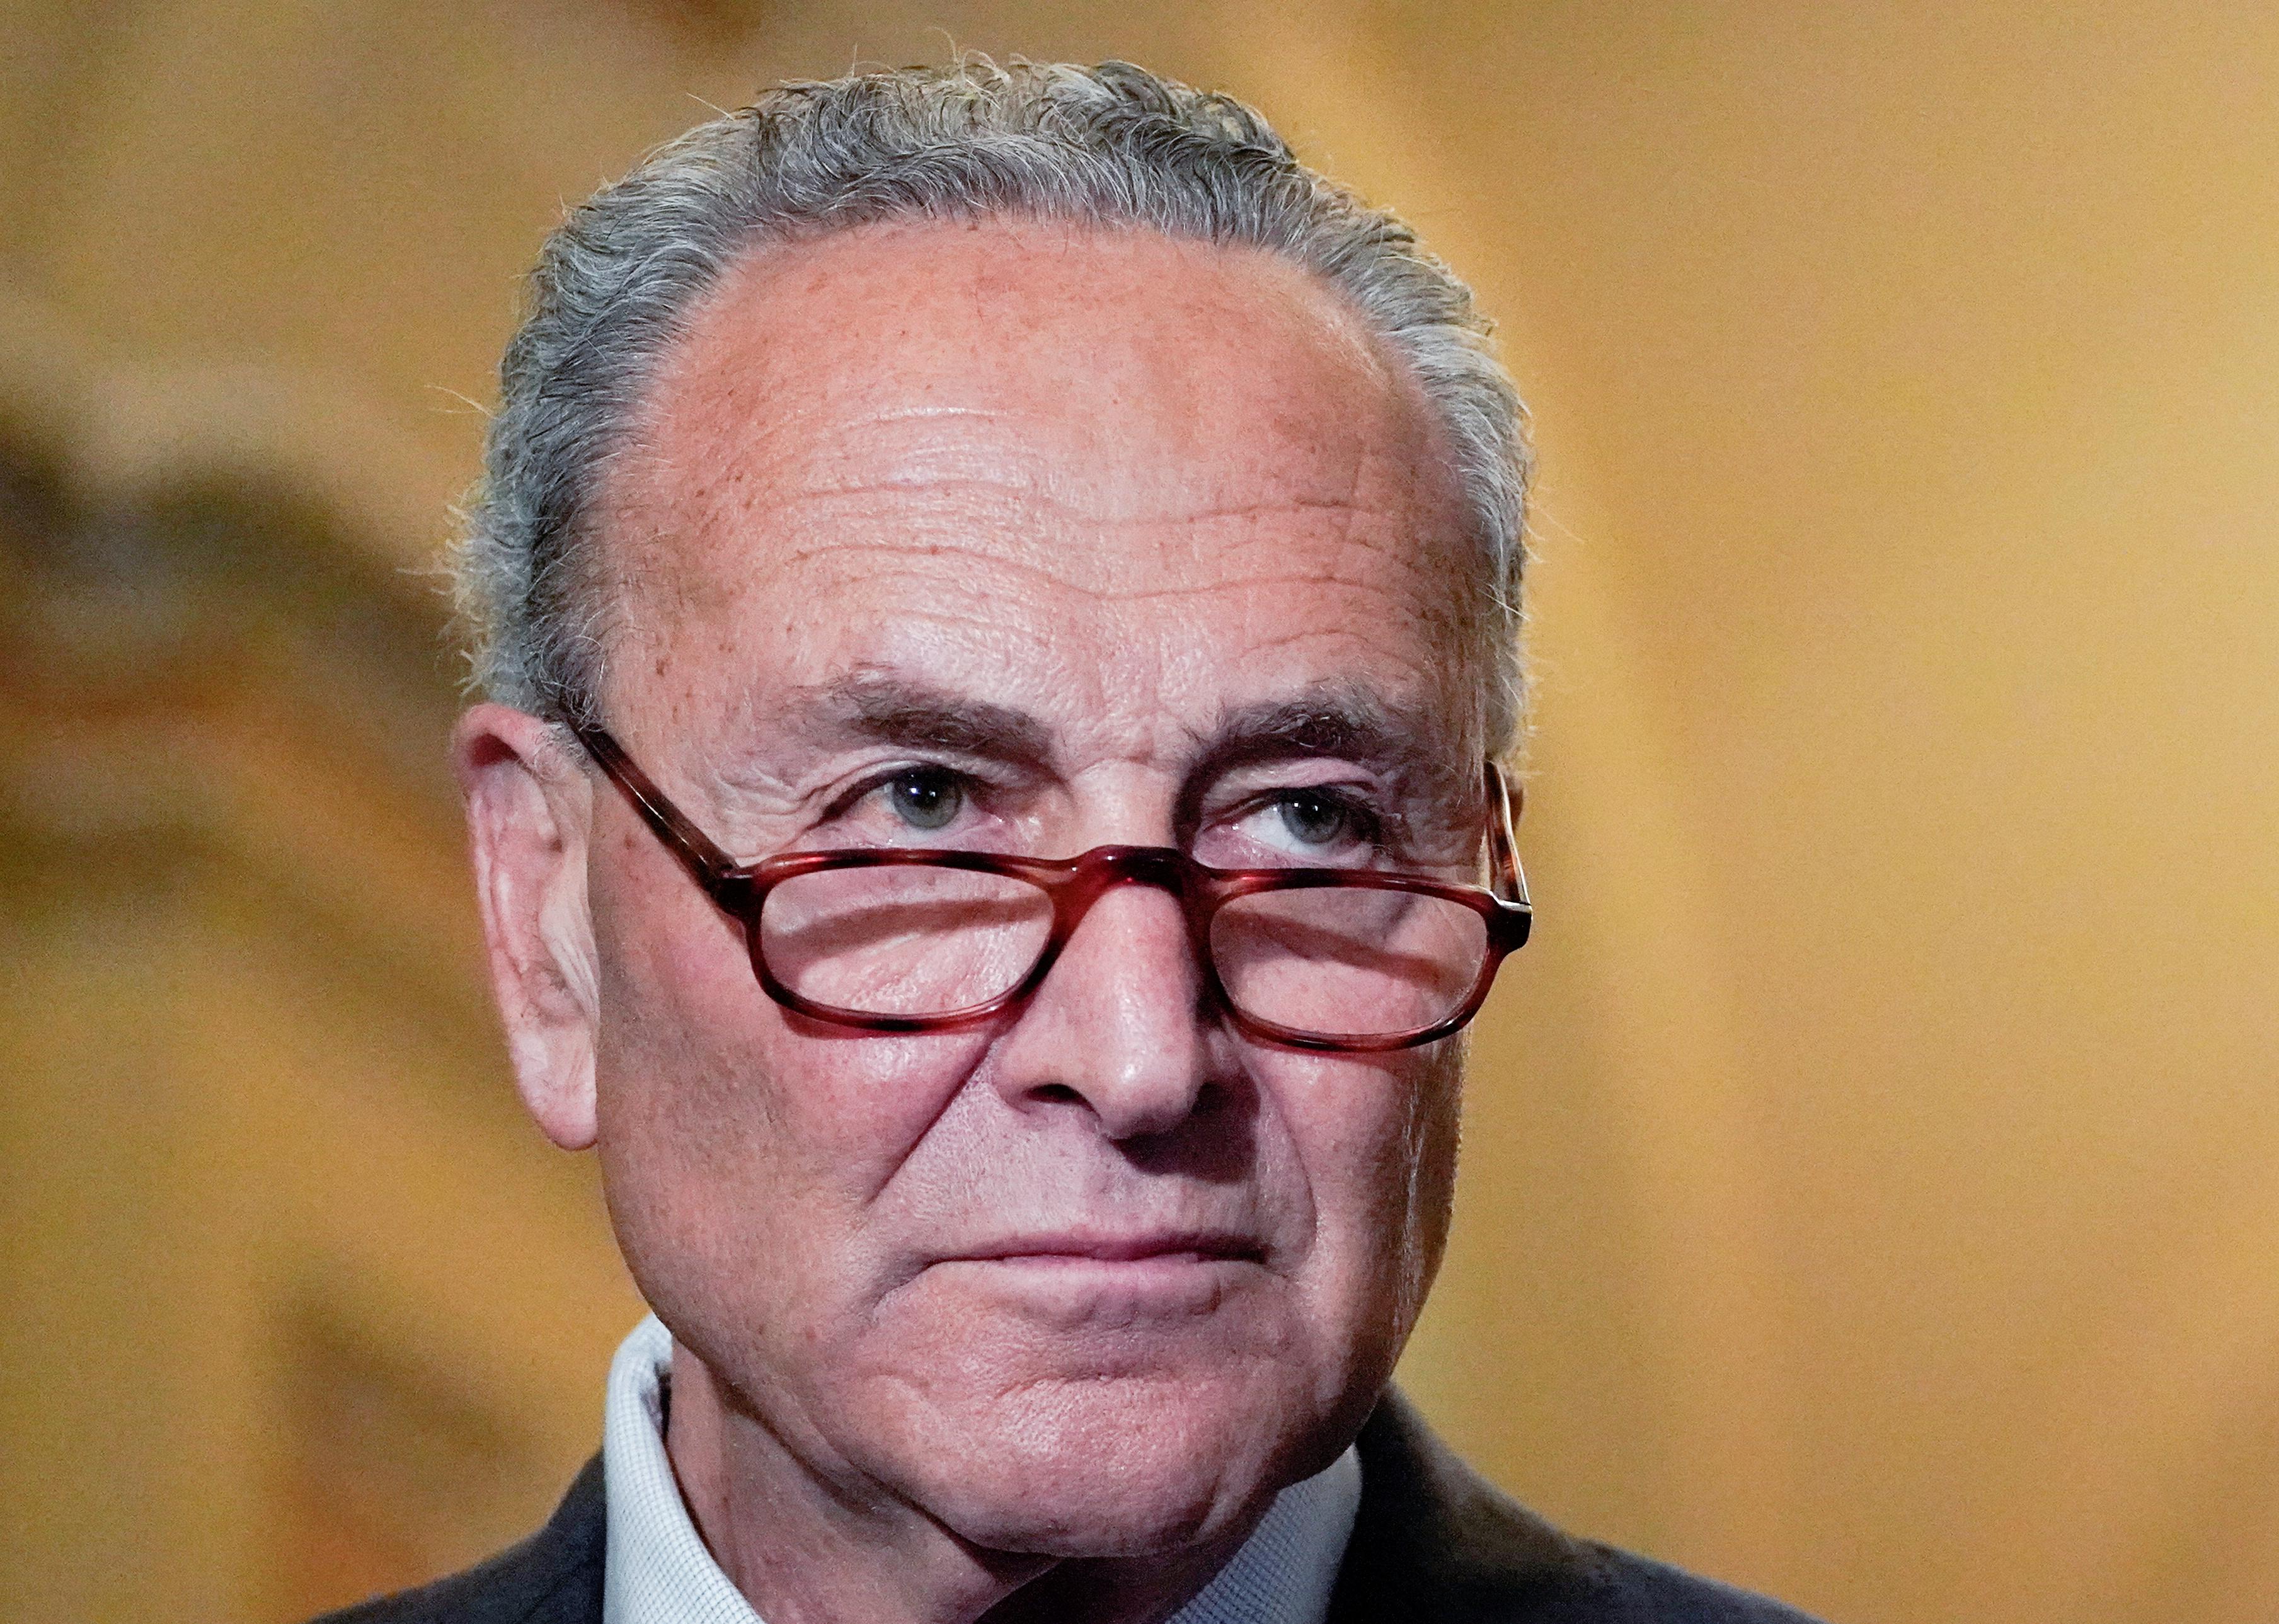 U.S. Senate Majority Leader Chuck Schumer (D-NY) faces reporters following the Senate Democrats weekly policy lunch at the U.S. Capitol in Washington, U.S., July 13, 2021.  REUTERS/Elizabeth Frantz